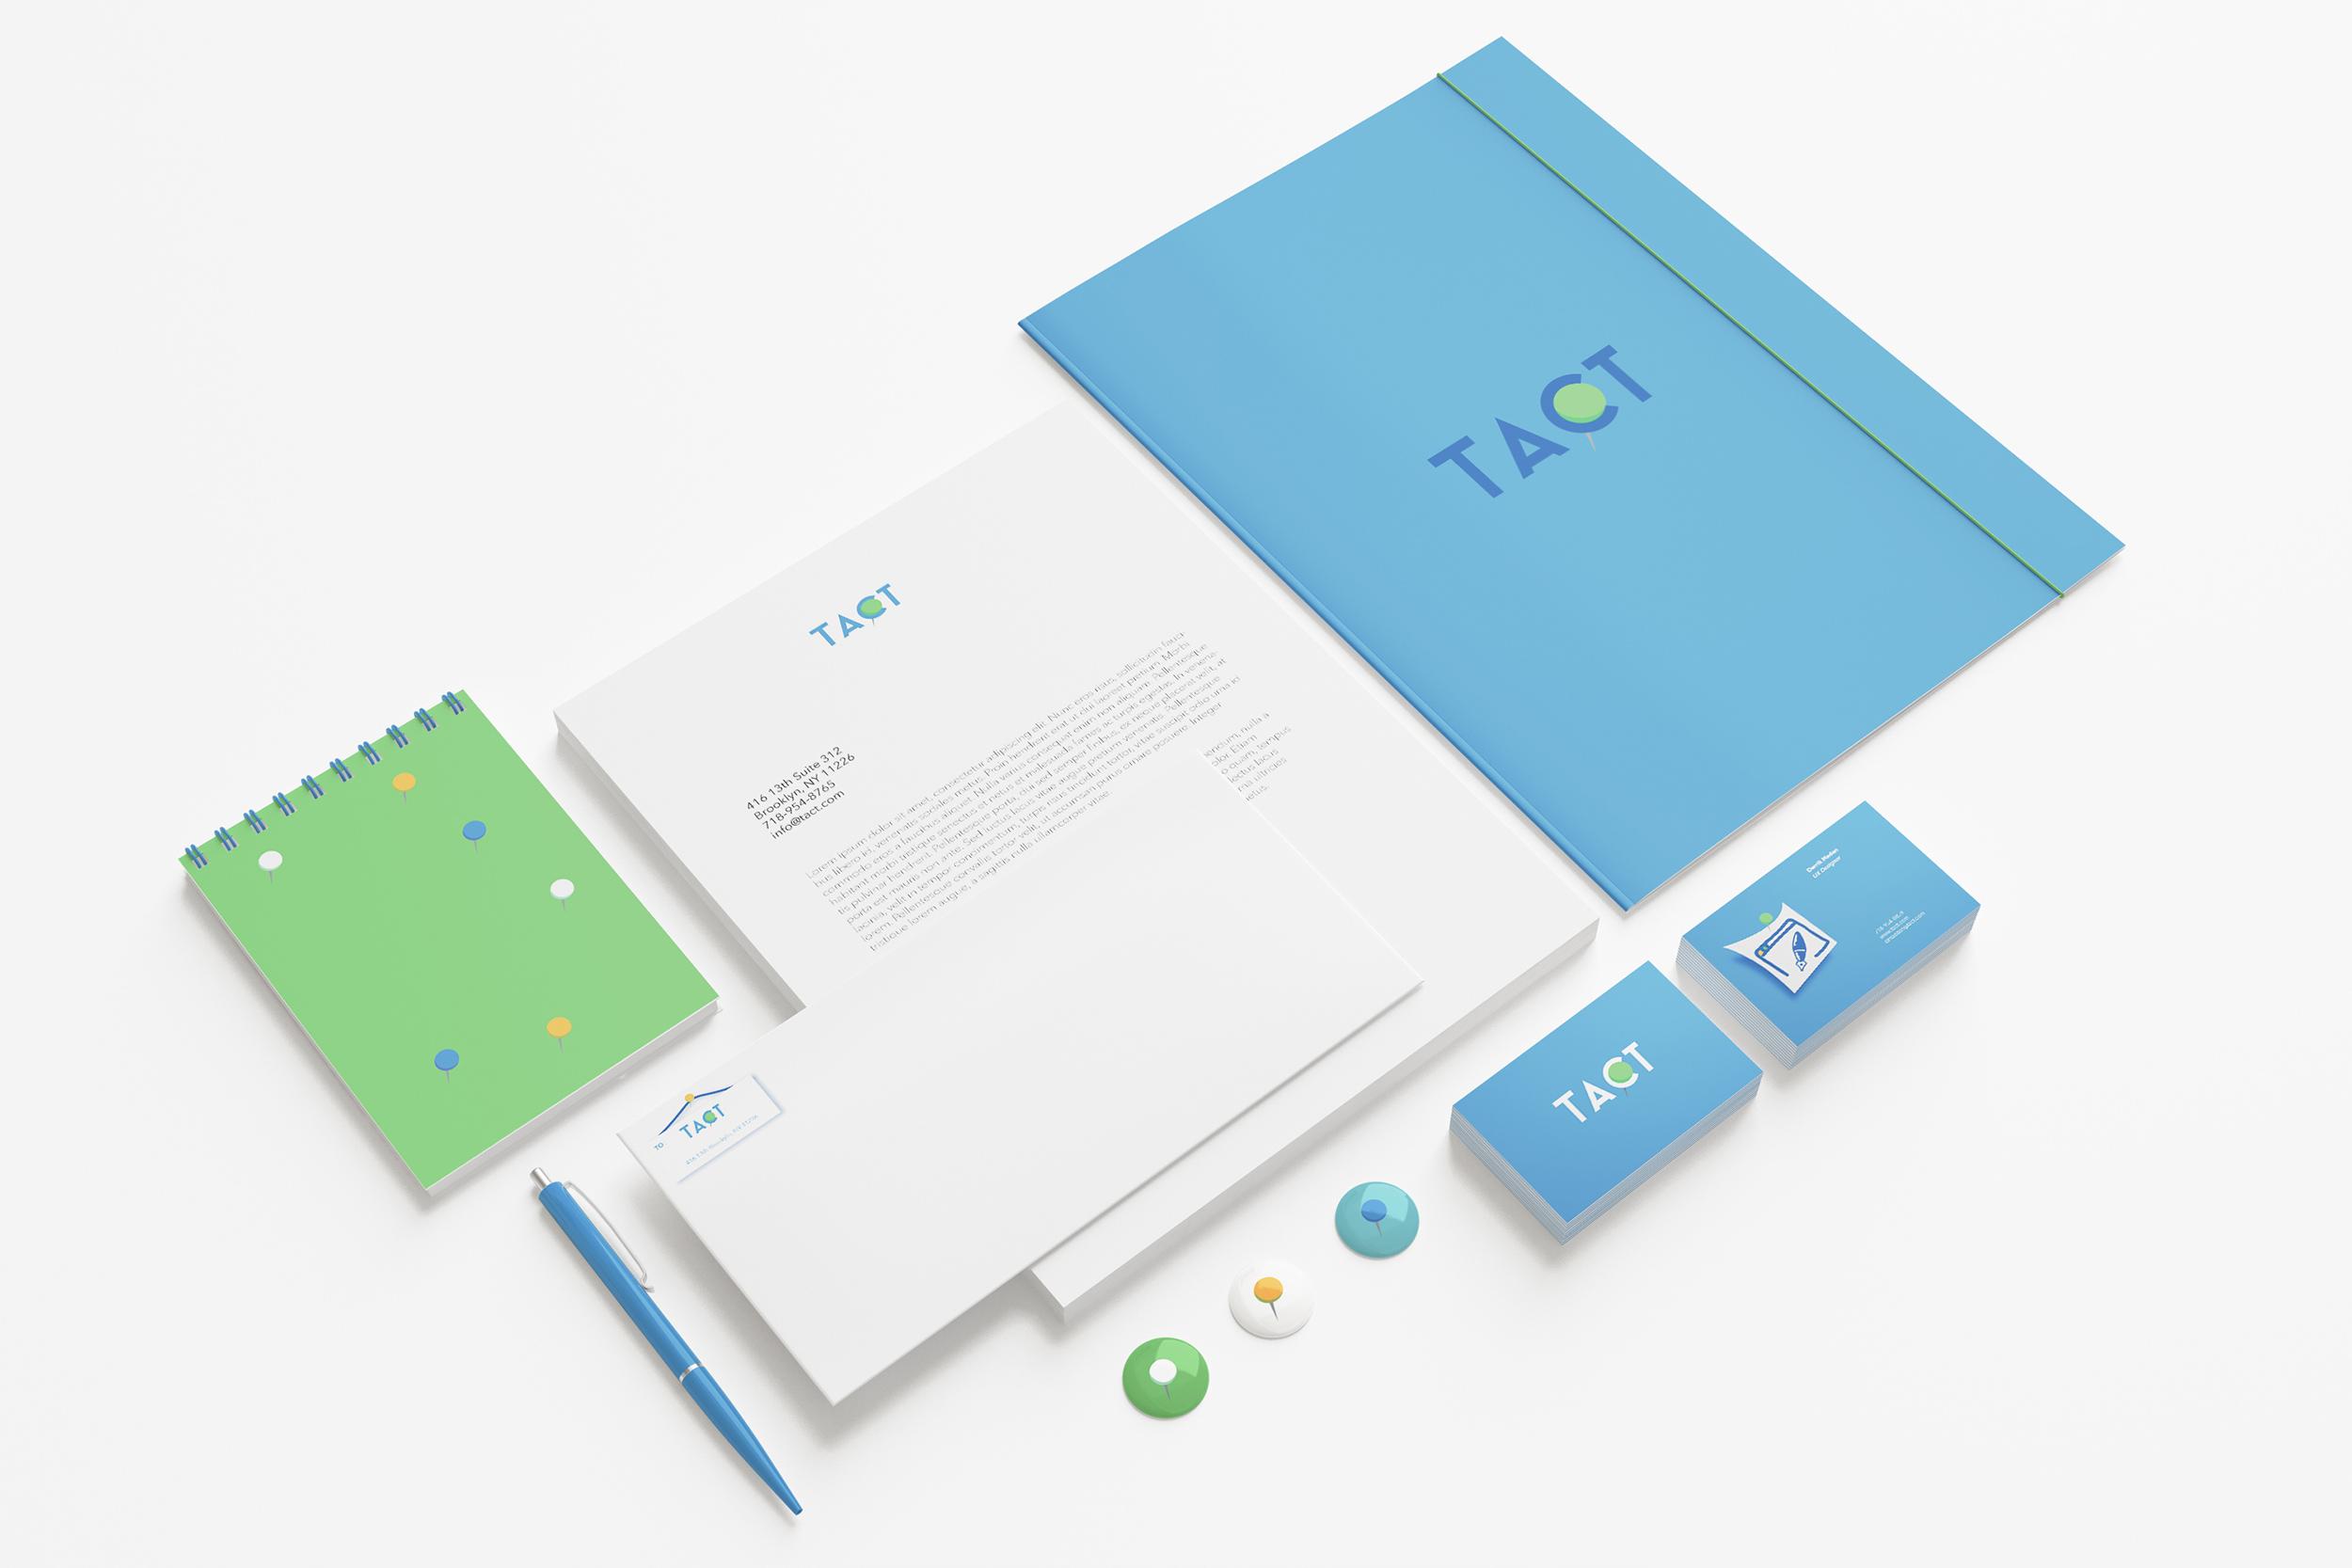 ibili-app_2500x1667_tact_2.jpg